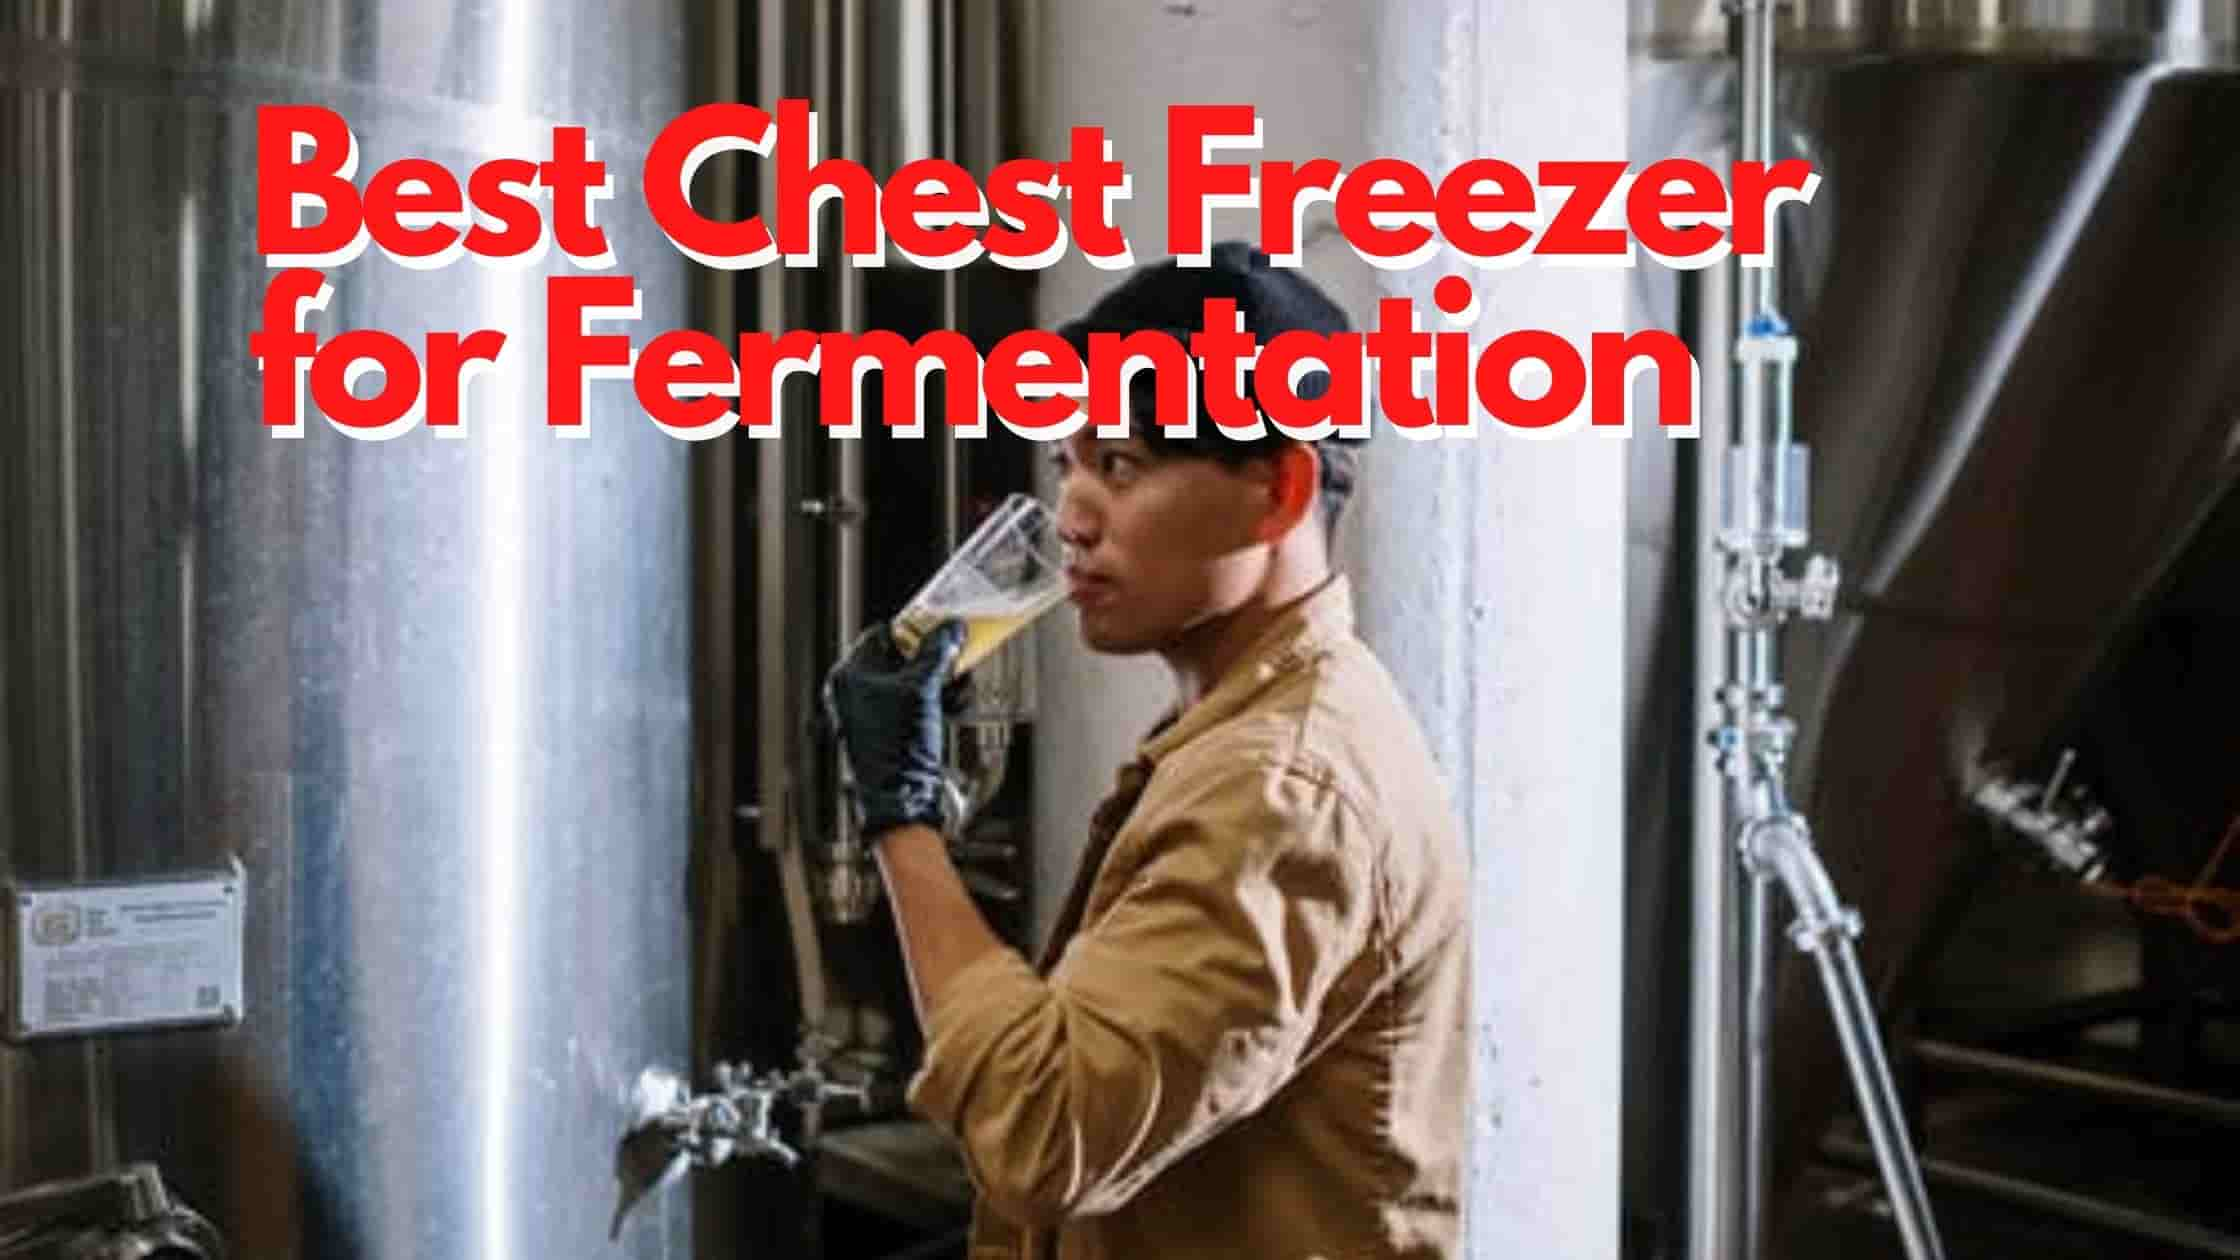 Best Chest Freezer for Fermentation